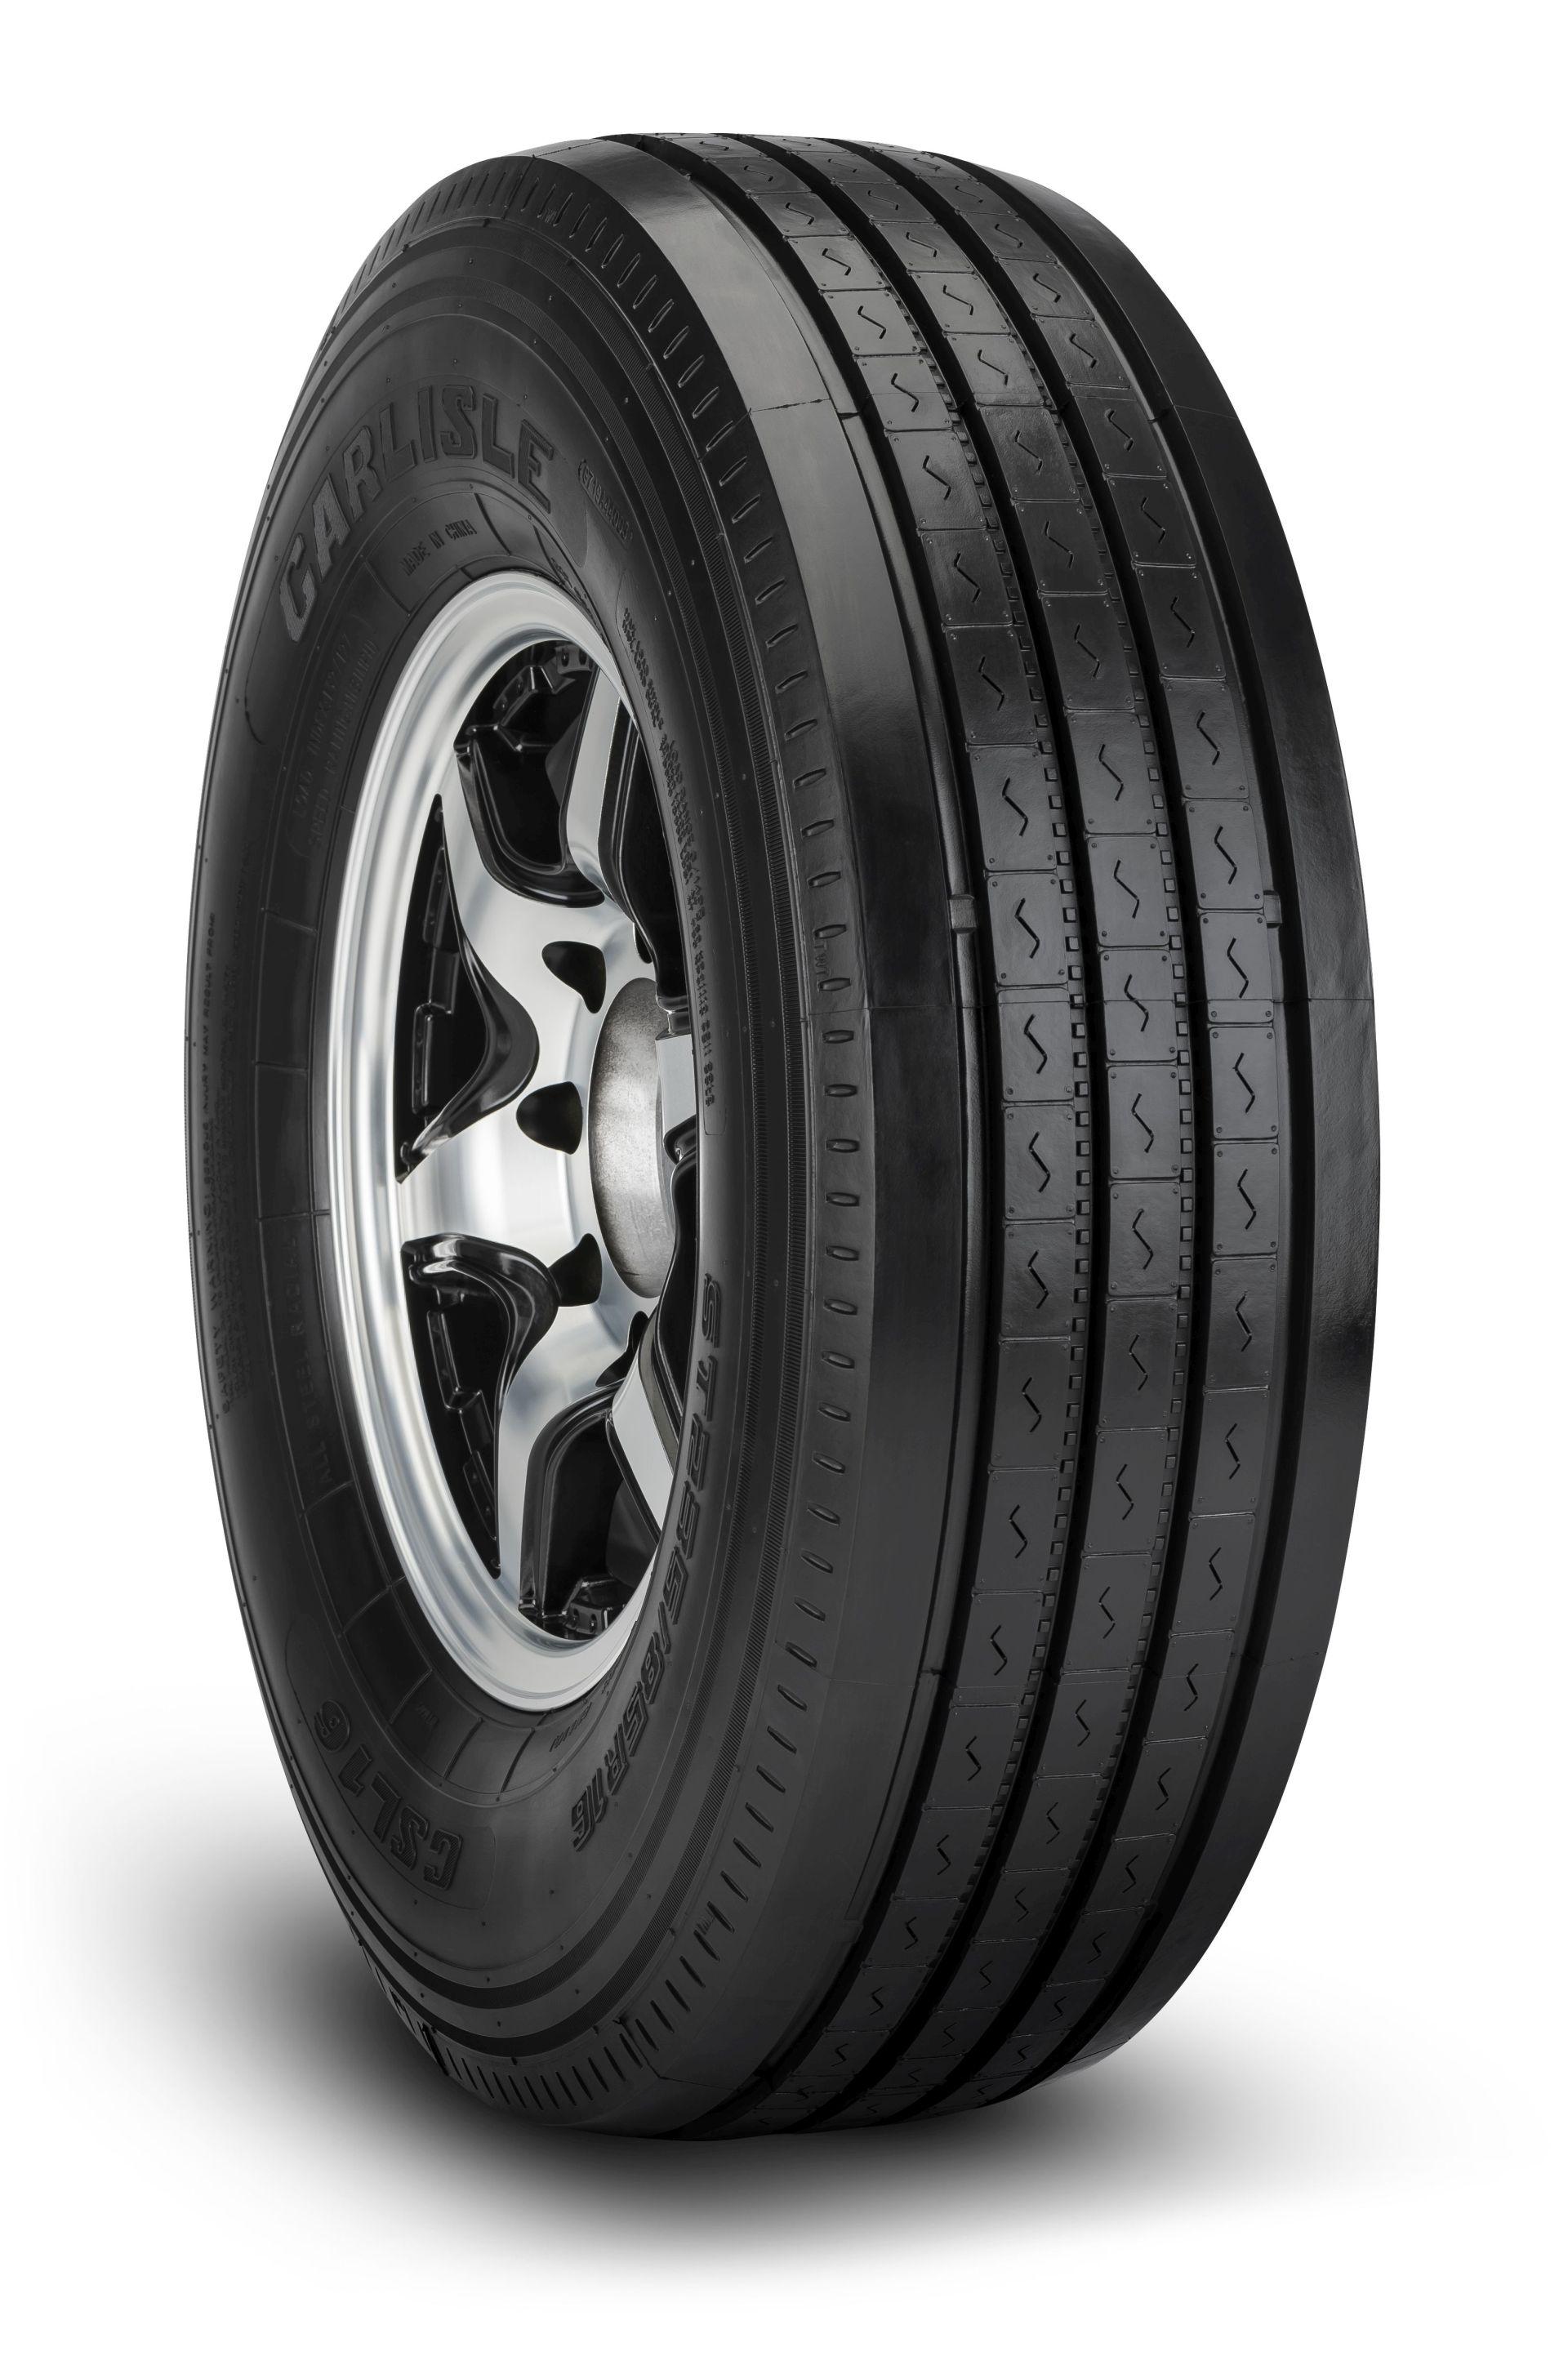 Carlstar Has a New All-Steel Radial Trailer Tire